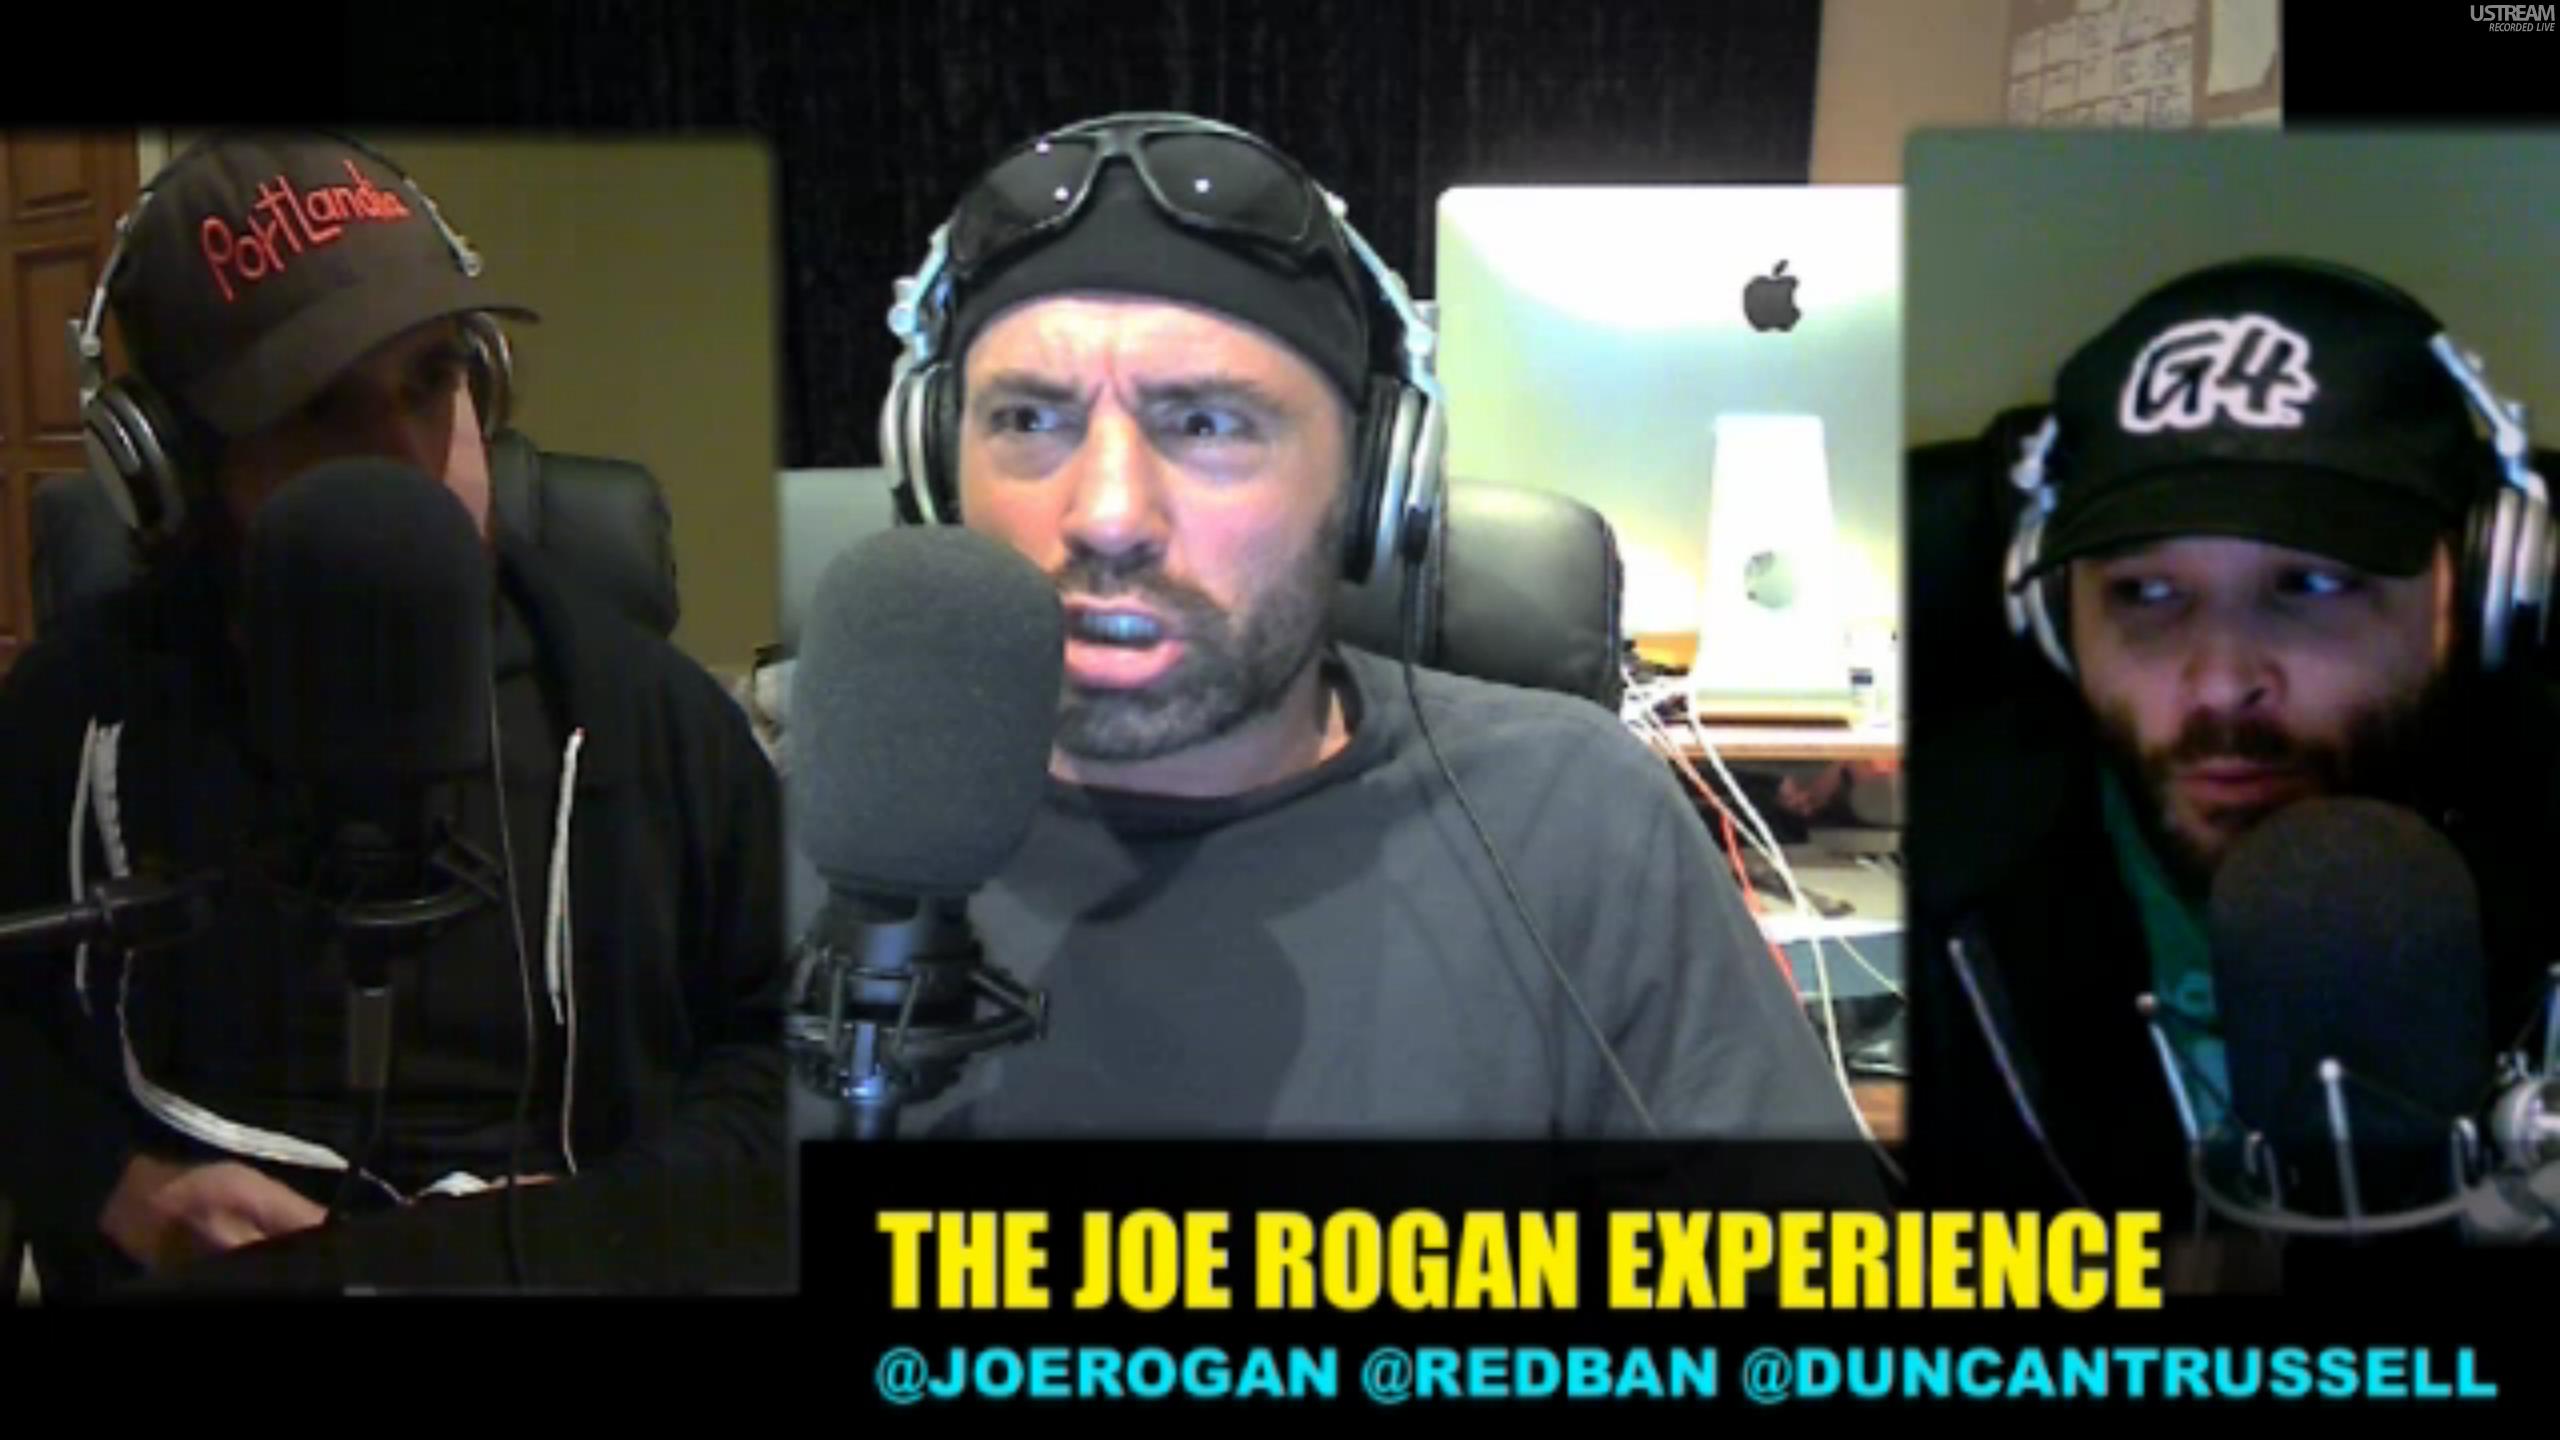 The Joe Rogan Experience PODCAST #166 - Duncan Trussell, Brian Redban